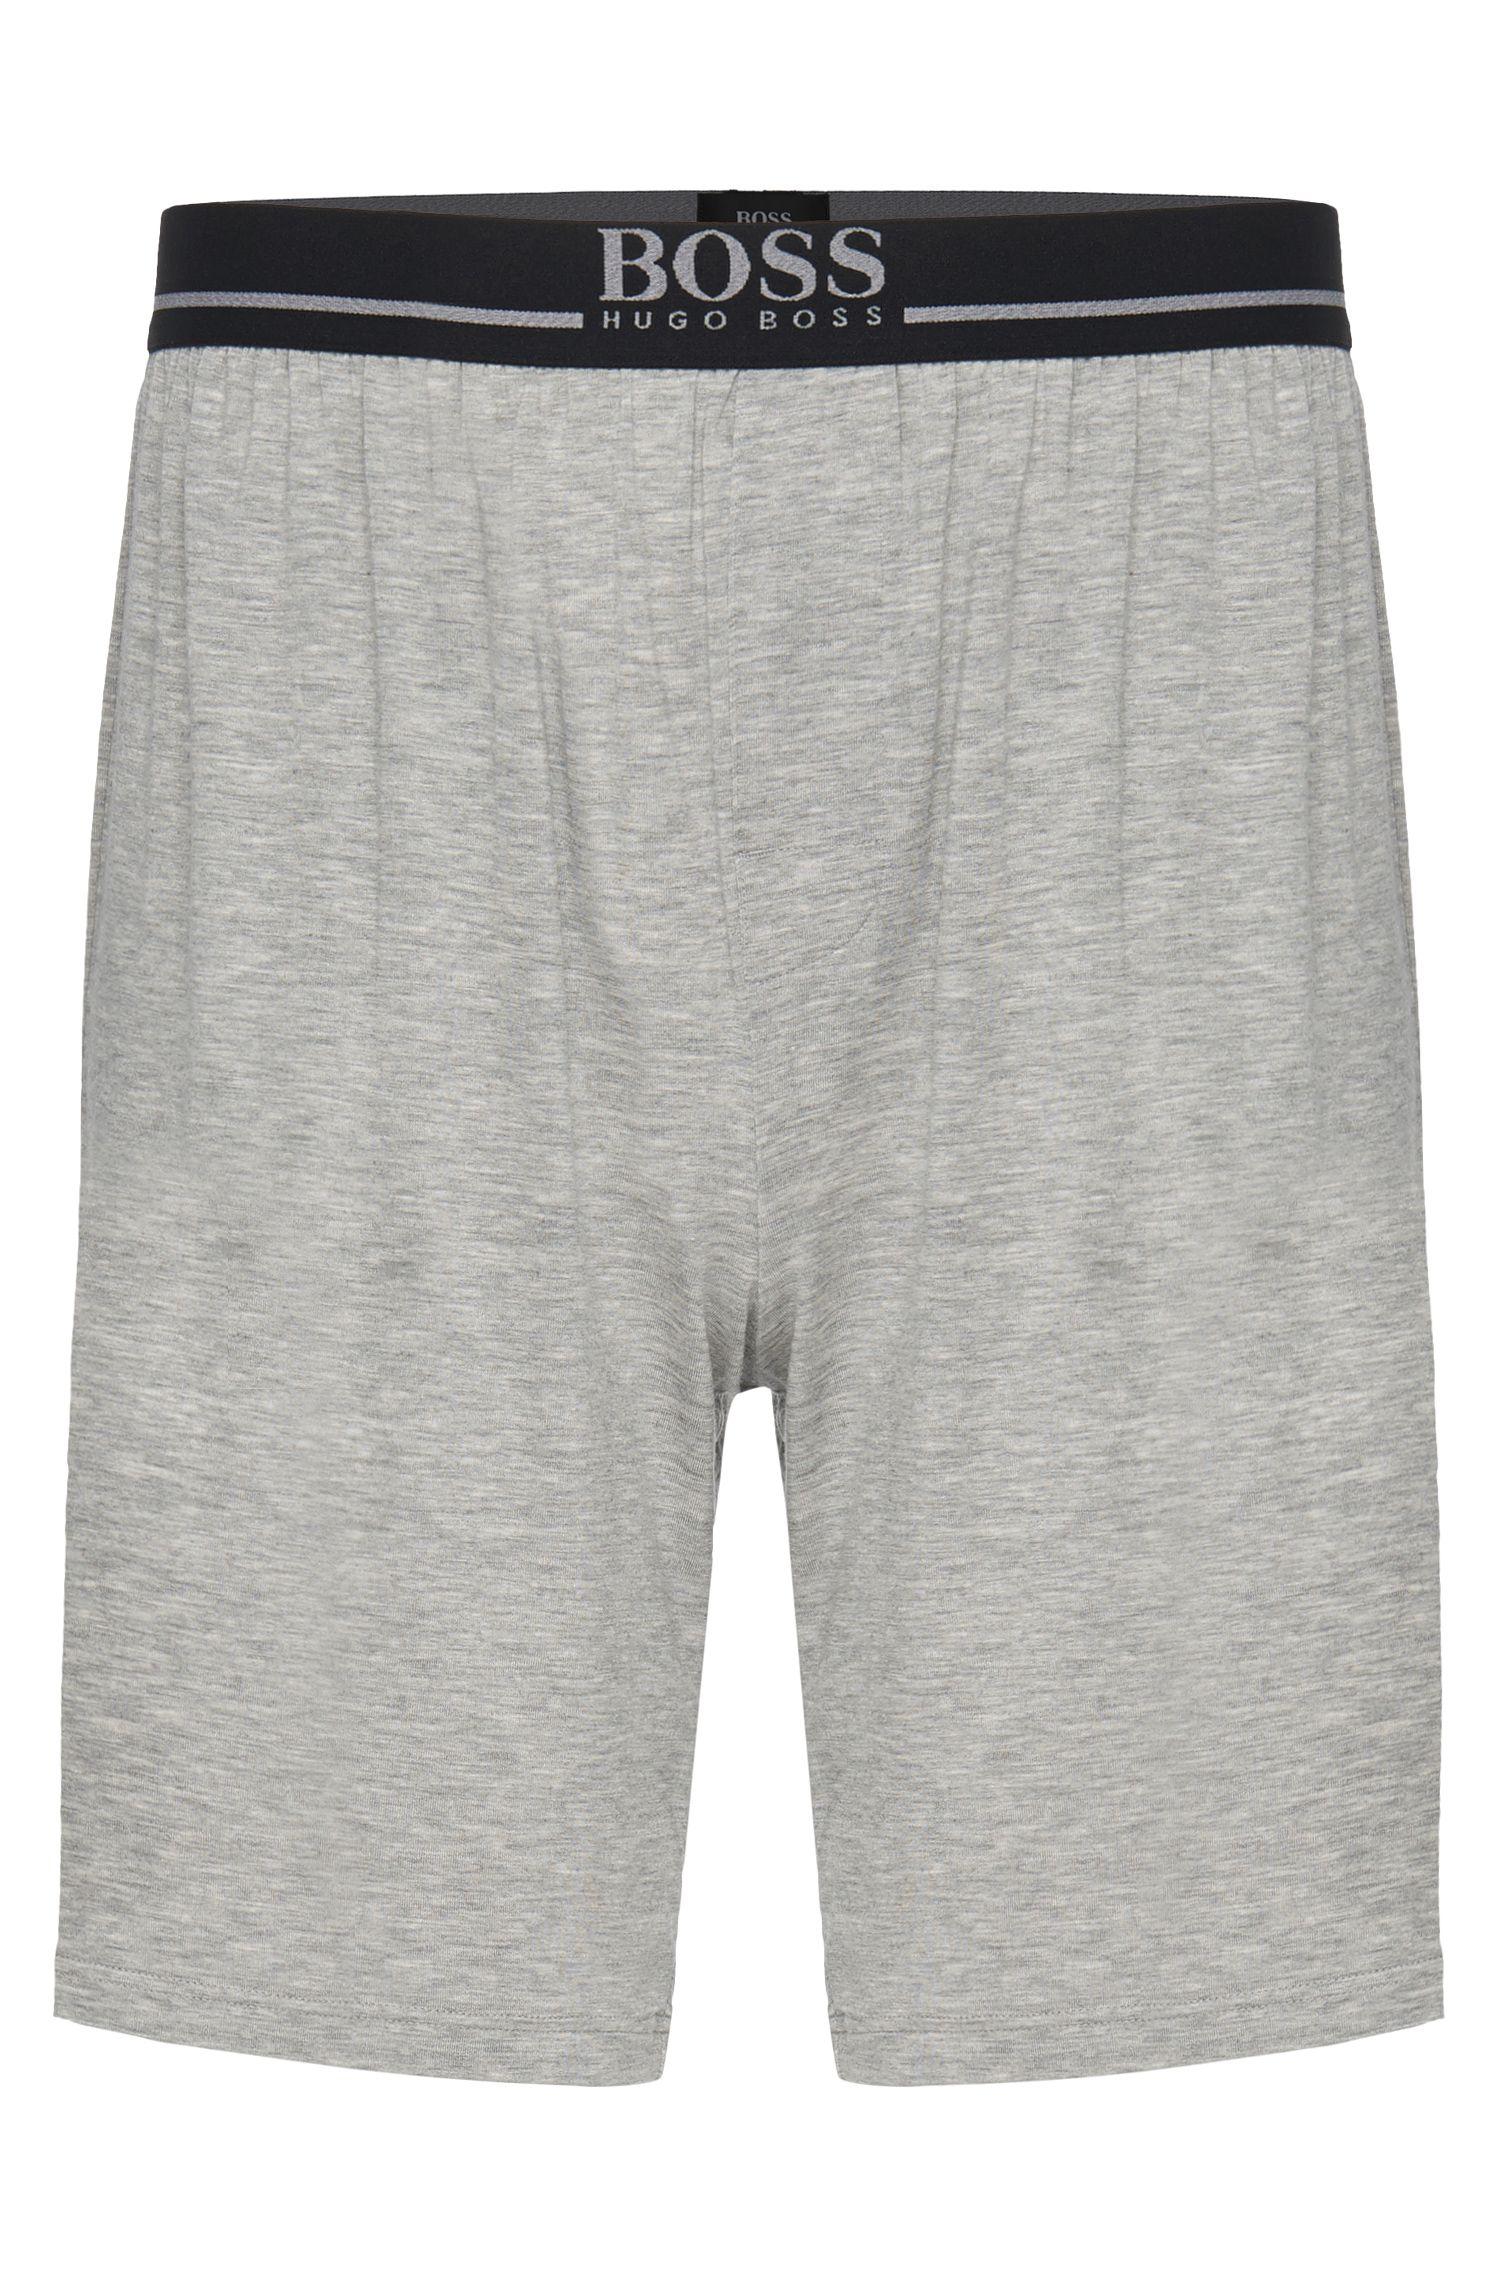 Shorts in stretch modal: 'Short Pant EW'